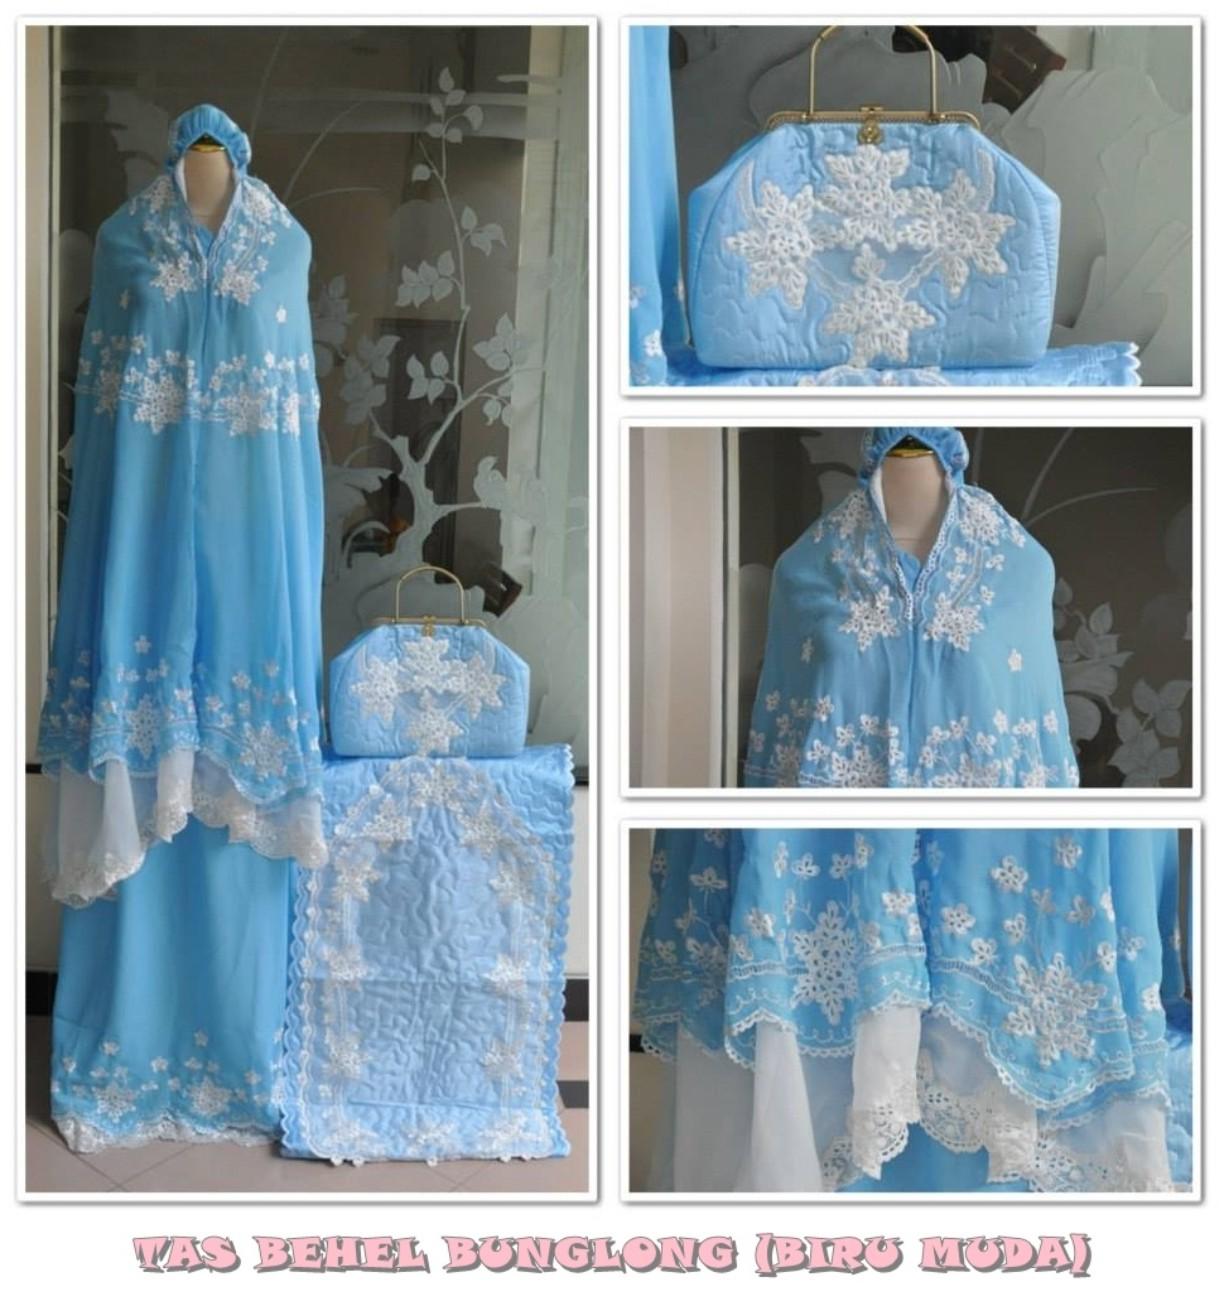 Telekung Kanak Kanak Murah Jual Baju Online Murah Tudungpeople Dress Muslimah Kain Cotton Murah